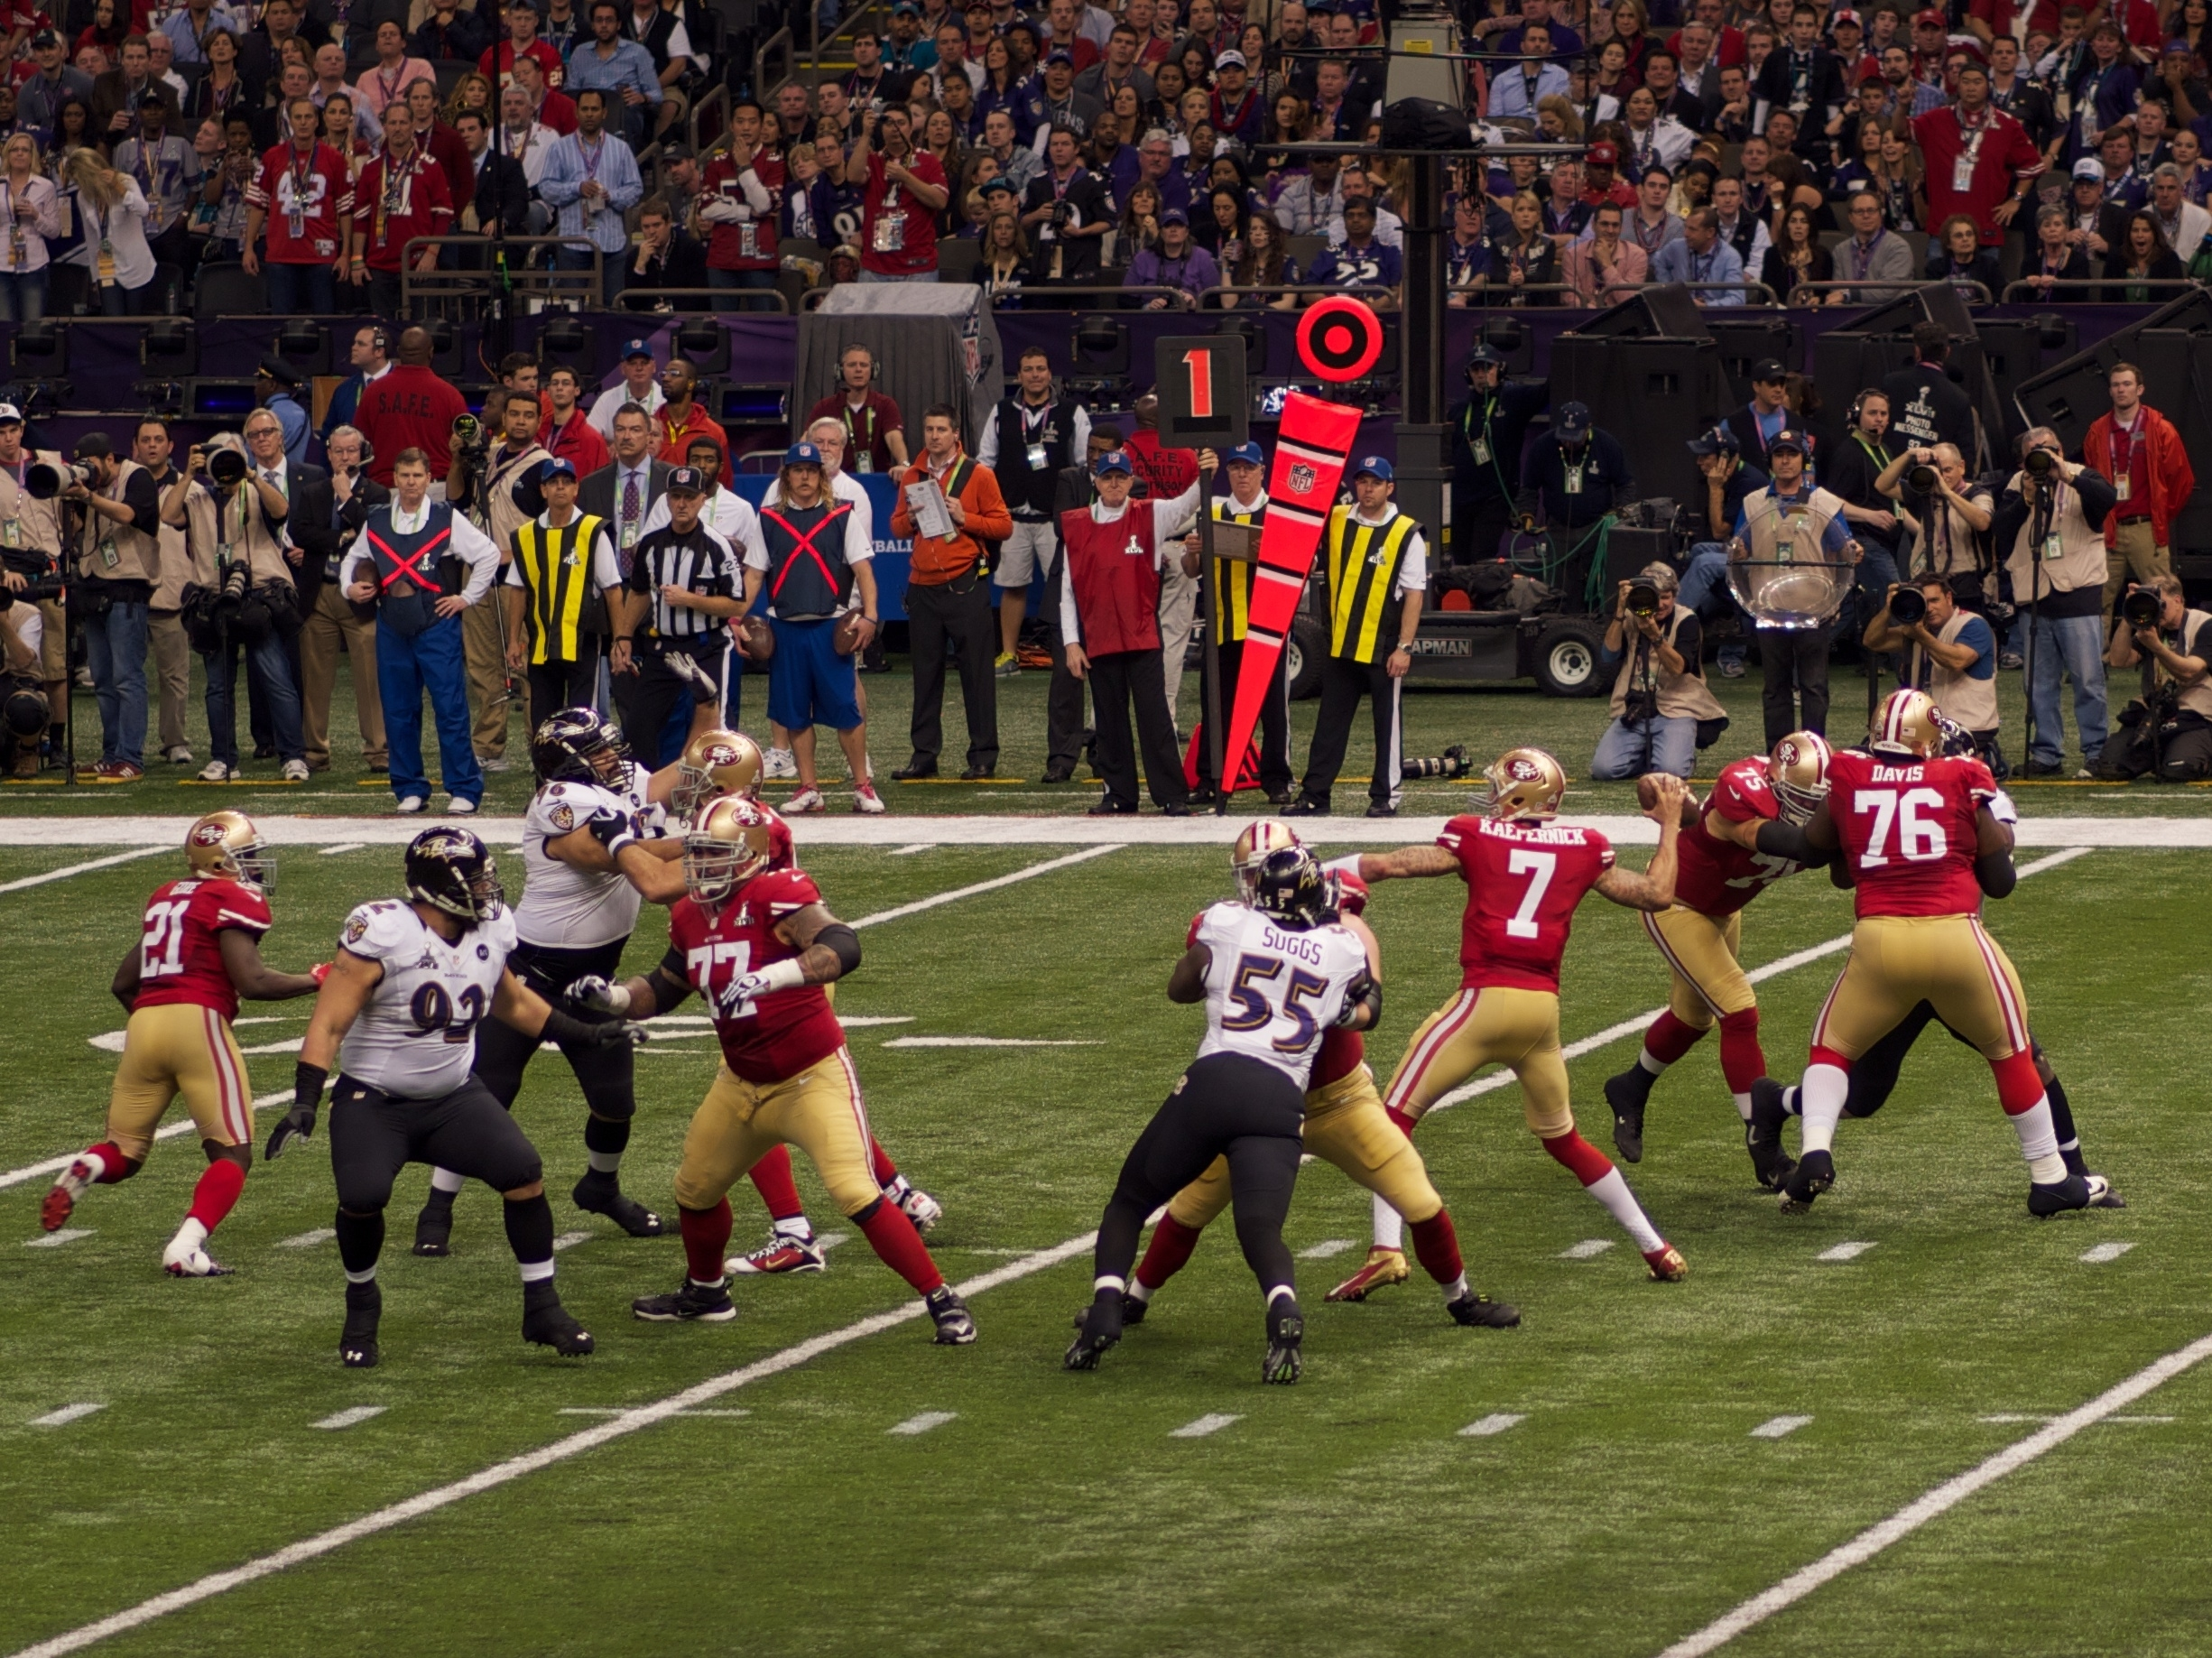 File:colin Kaepernick In Super Bowl Xlvii - Wikimedia with regard to Colin Kaepernick Super Bowl